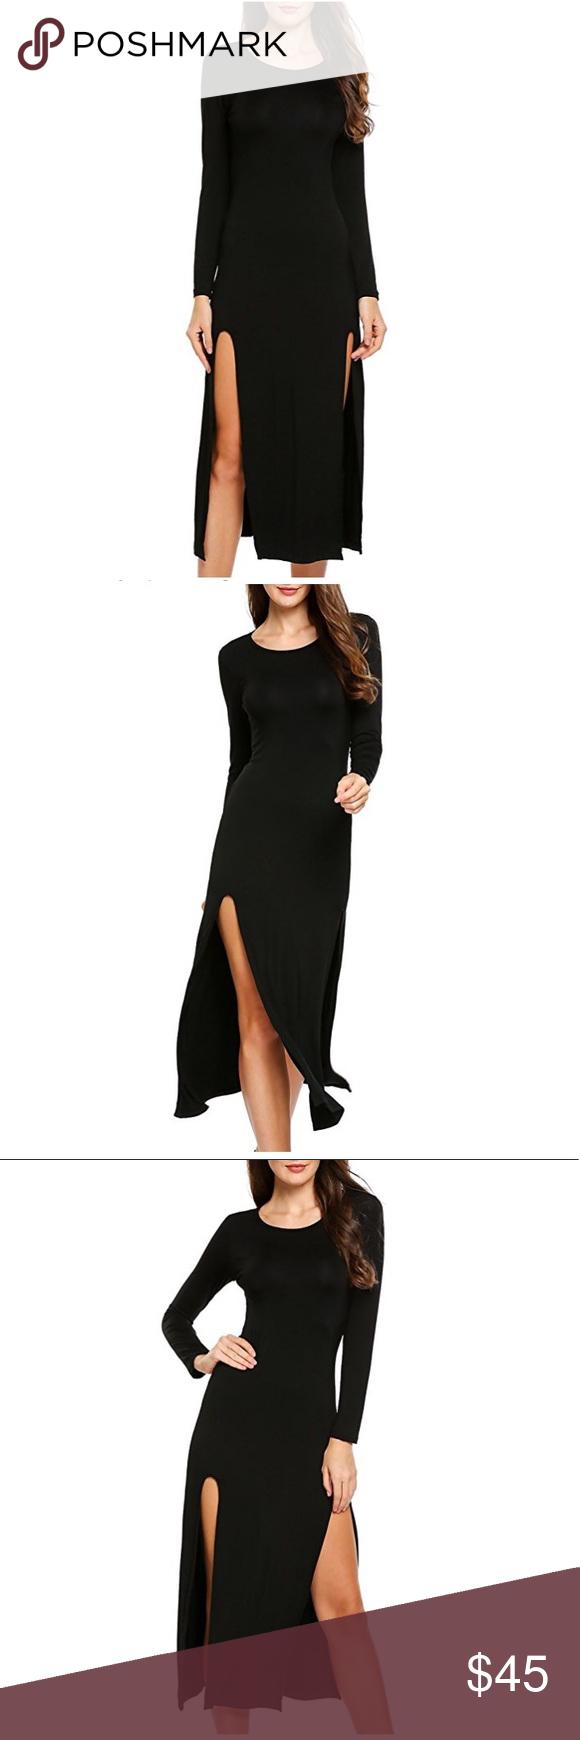 Last onesexy u sleek cotton maxi dress black boutique my